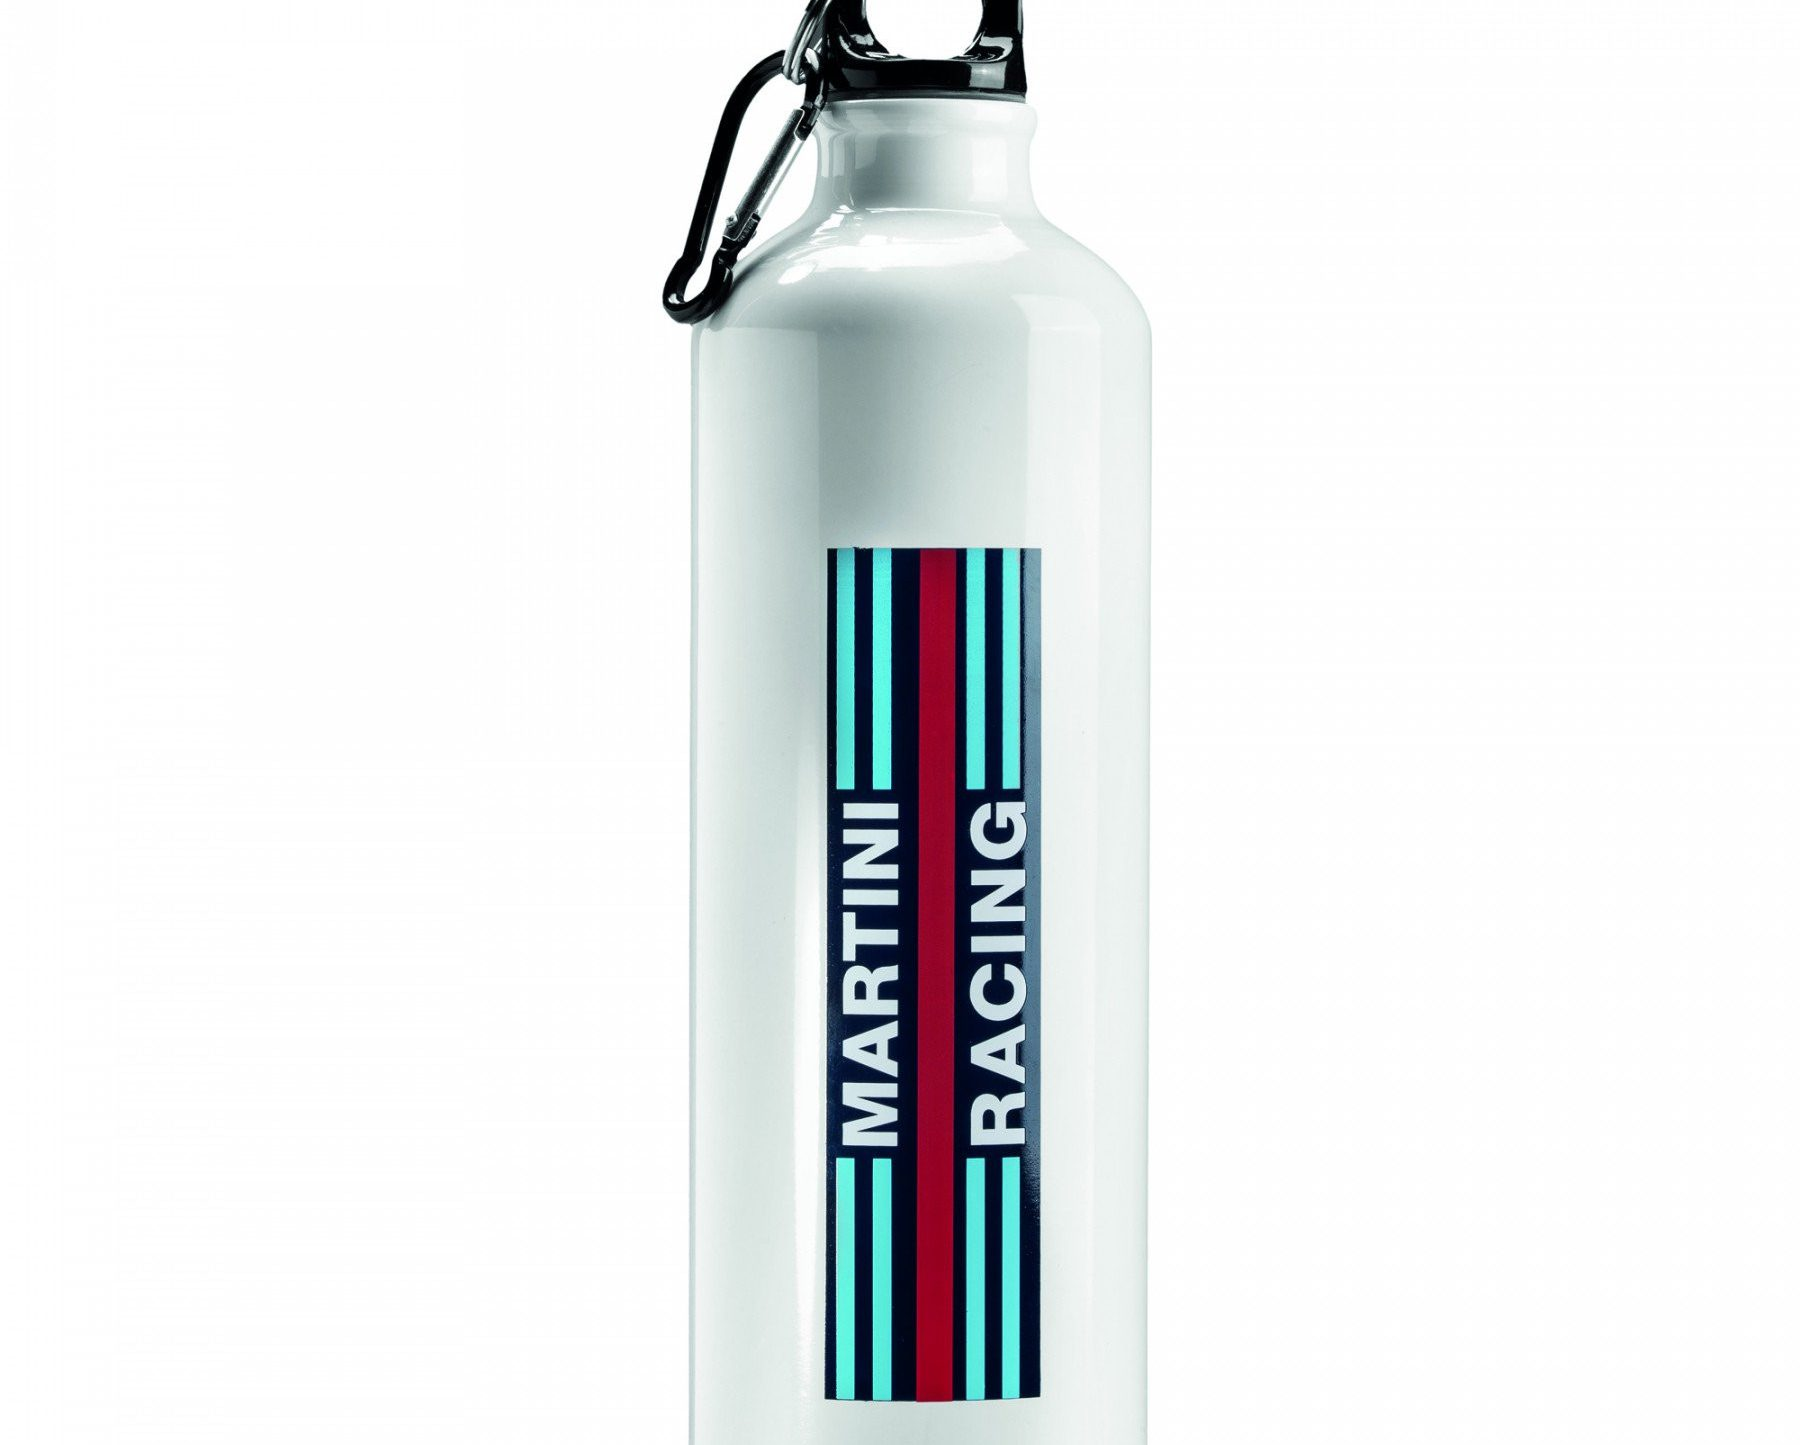 Нов продукт: Sparco Martini Racing, Water Bottle